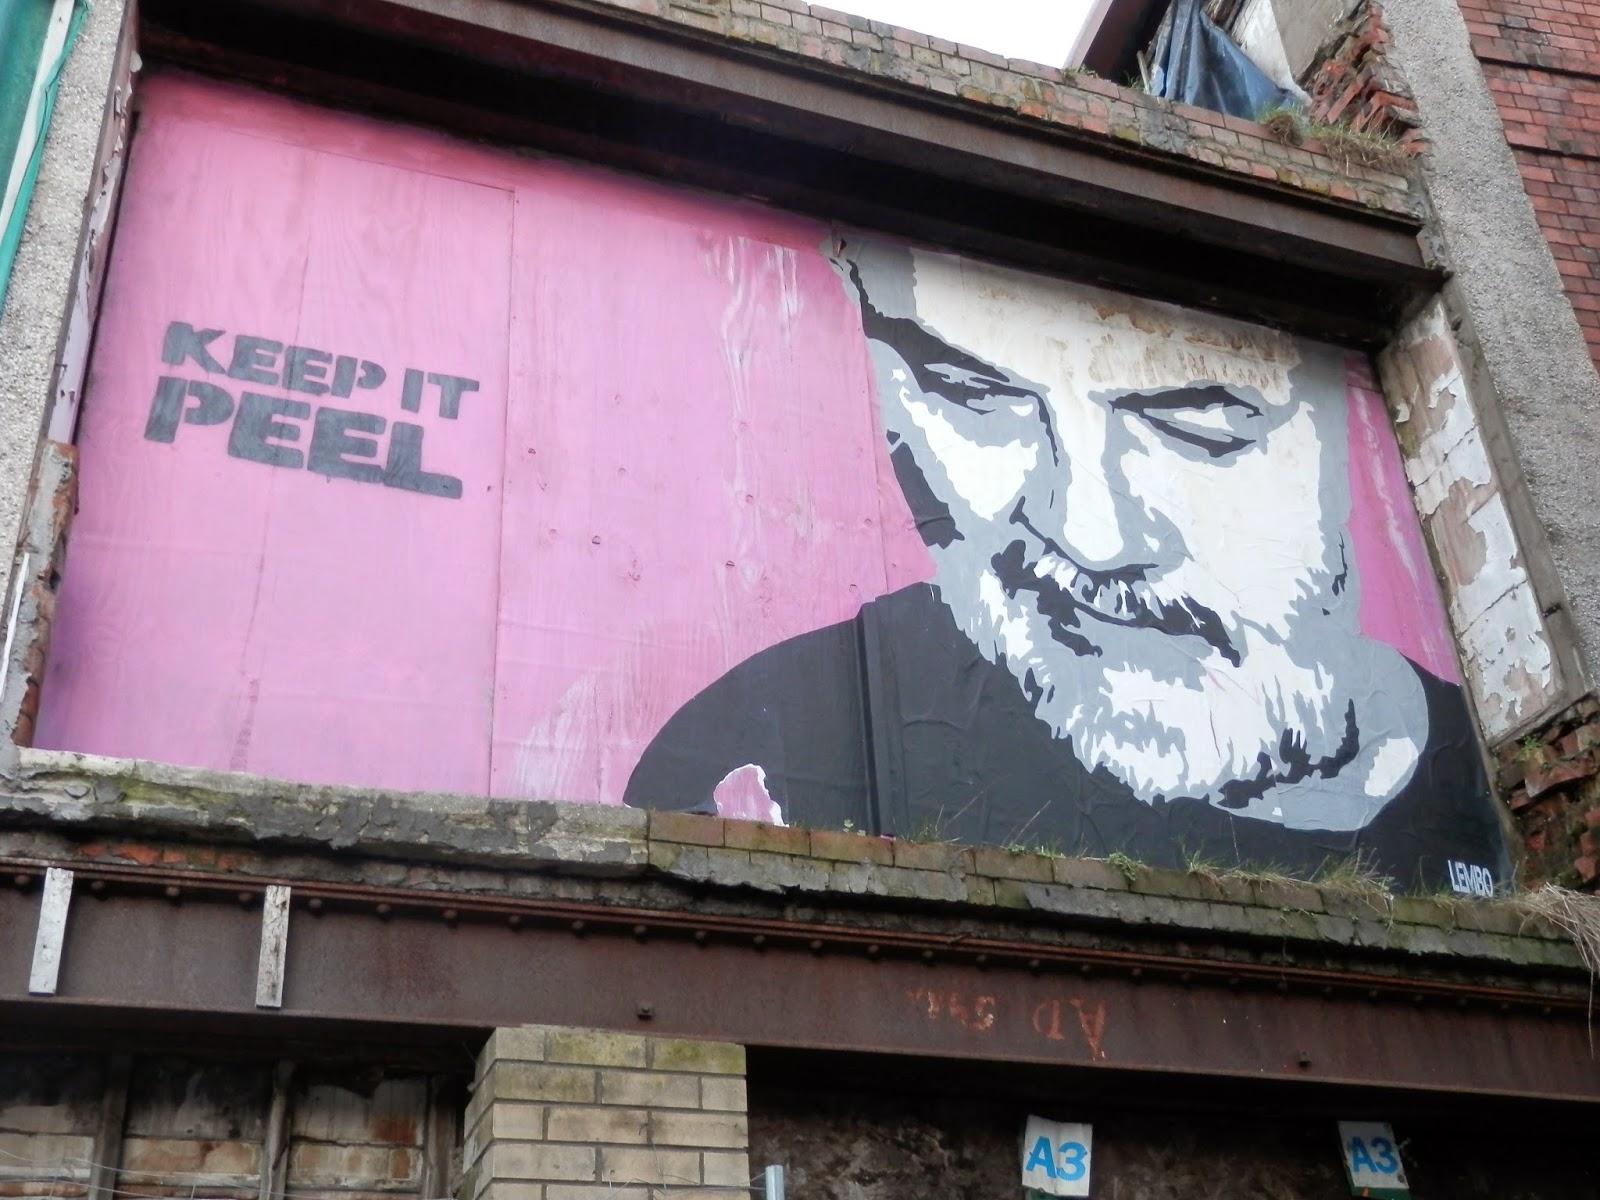 Street Art and Graffiti, Cardiff. secondhandsusie.blogspot.co.uk